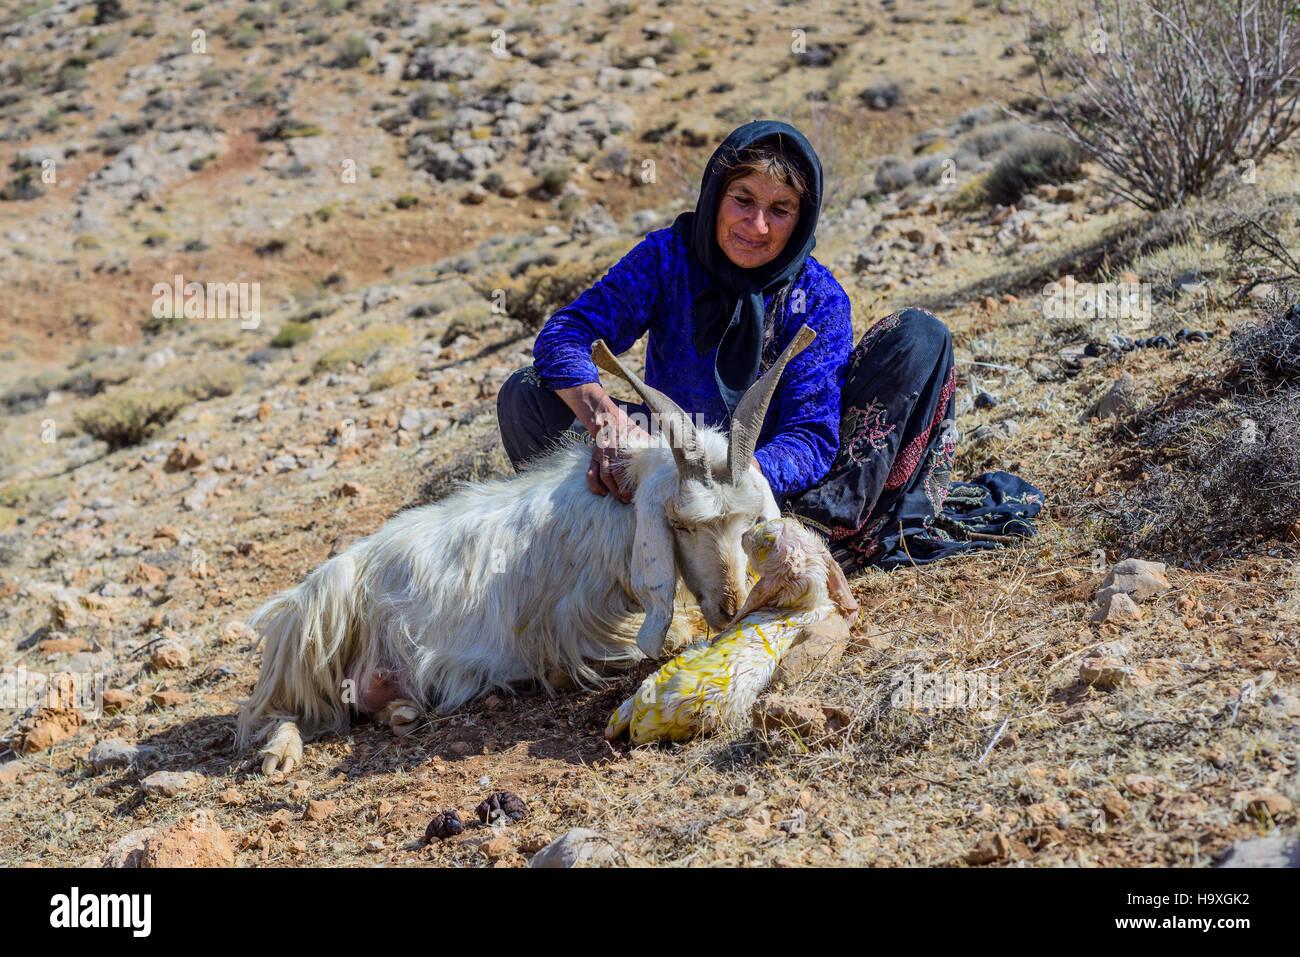 Qashqai nomads - Stock Image